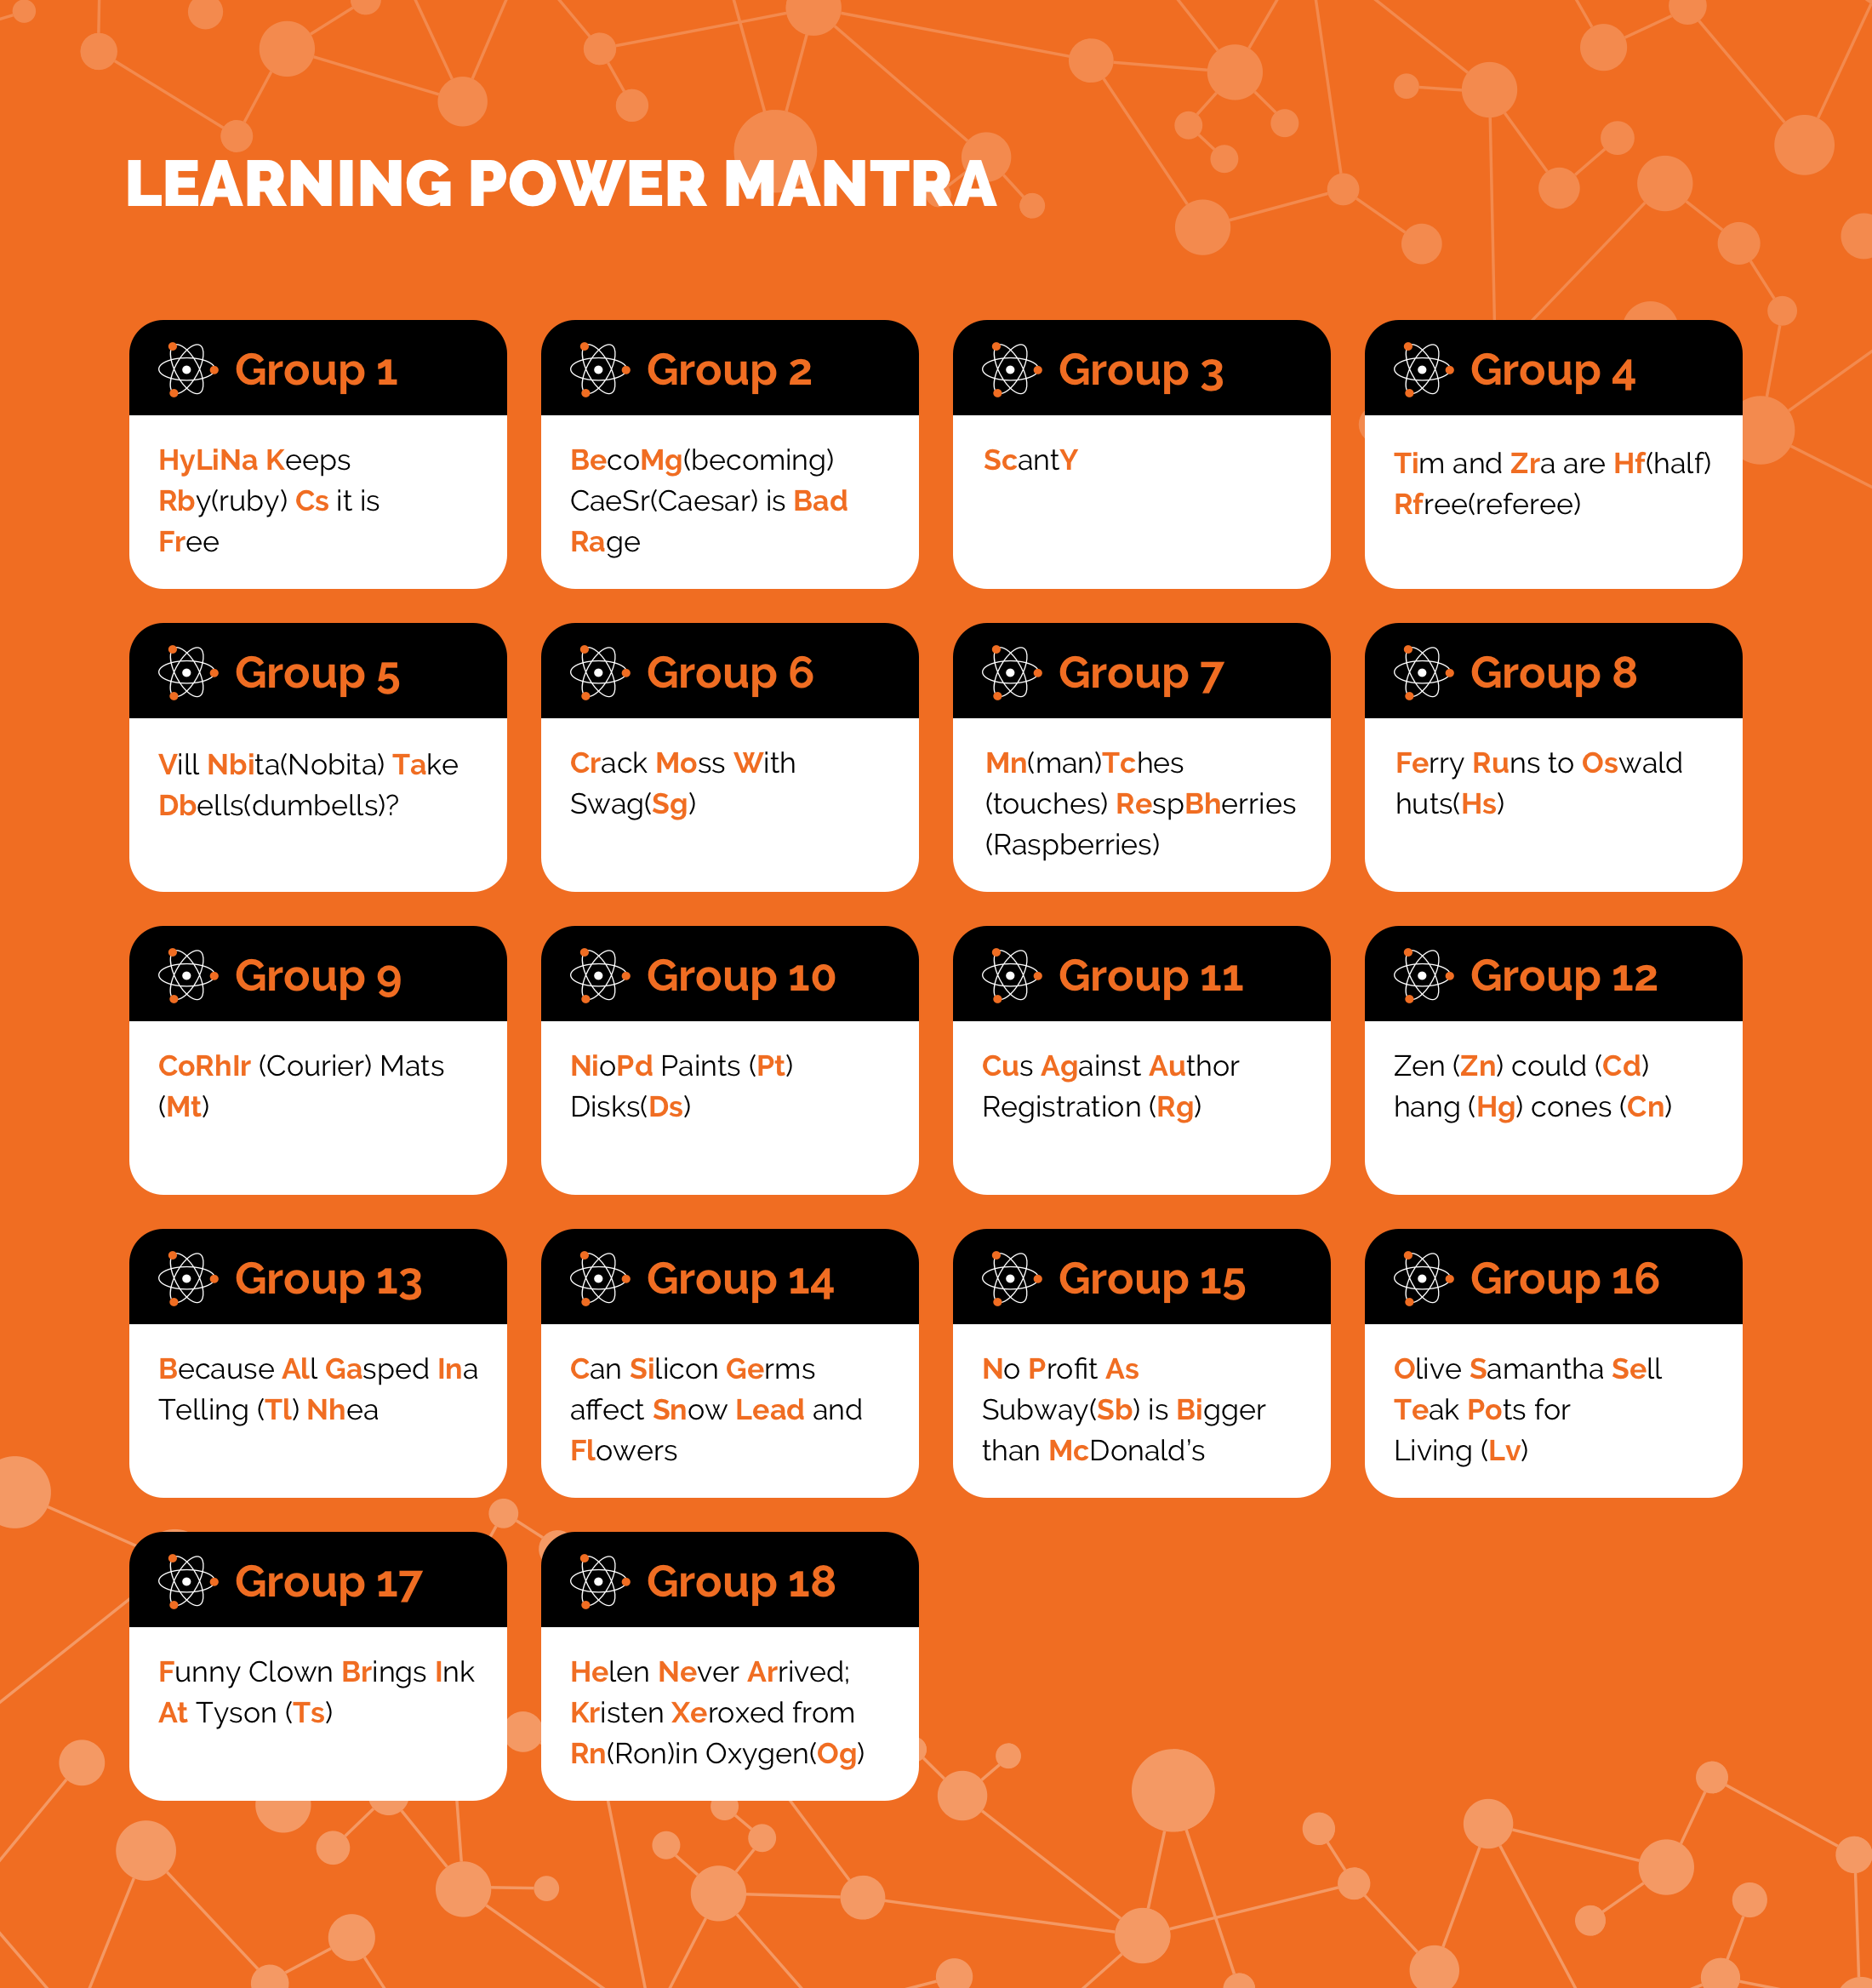 Power Mantra